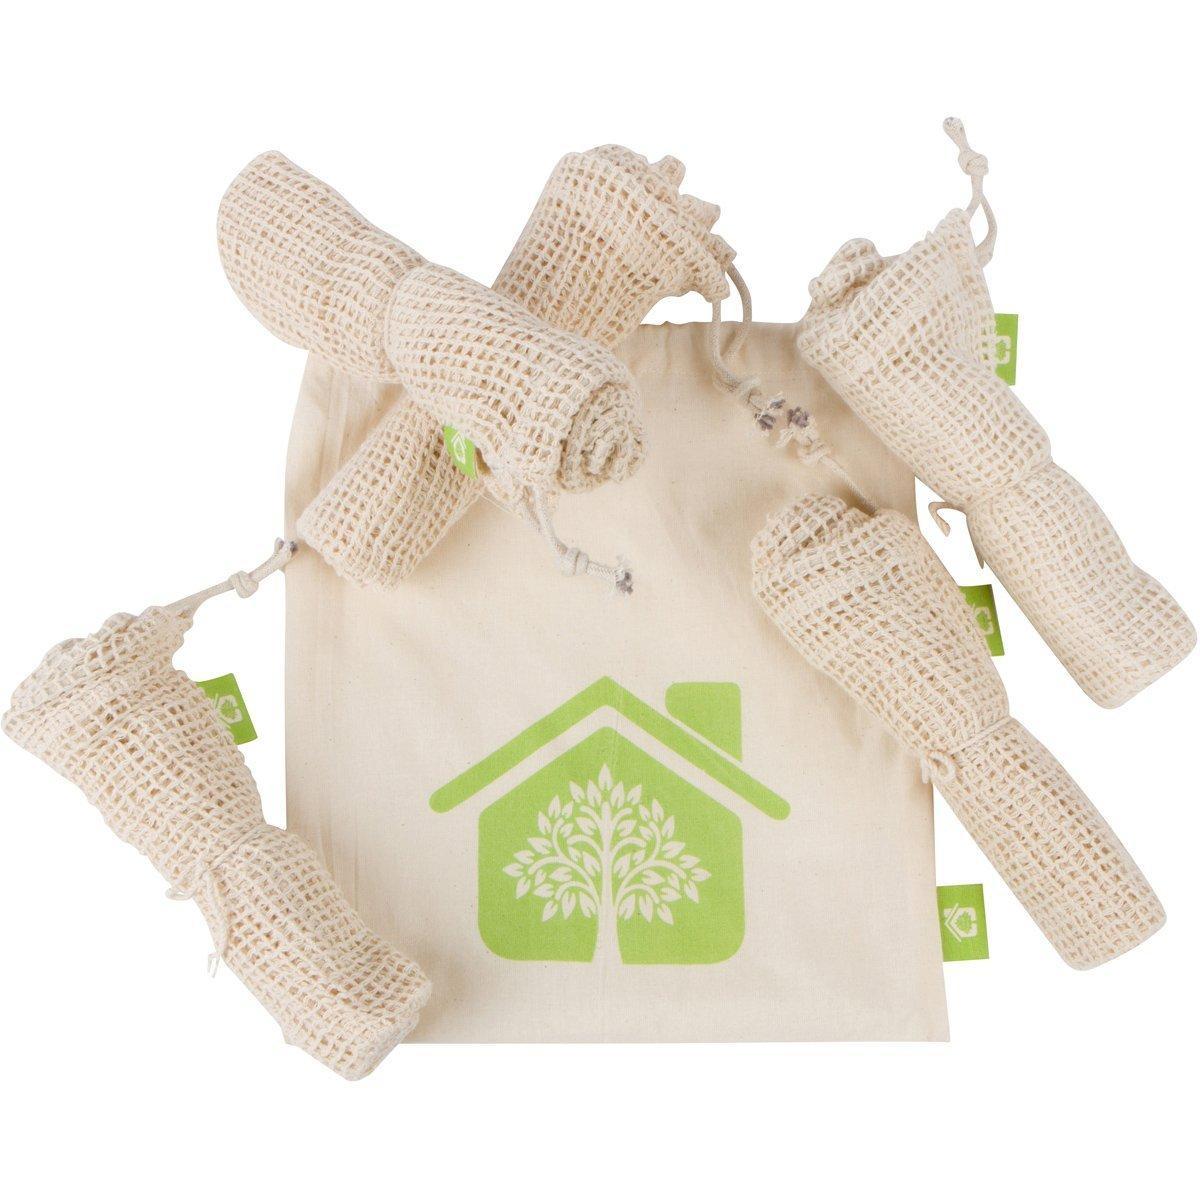 Reusable Produce Bags – Organic Cotton Mesh bags 3